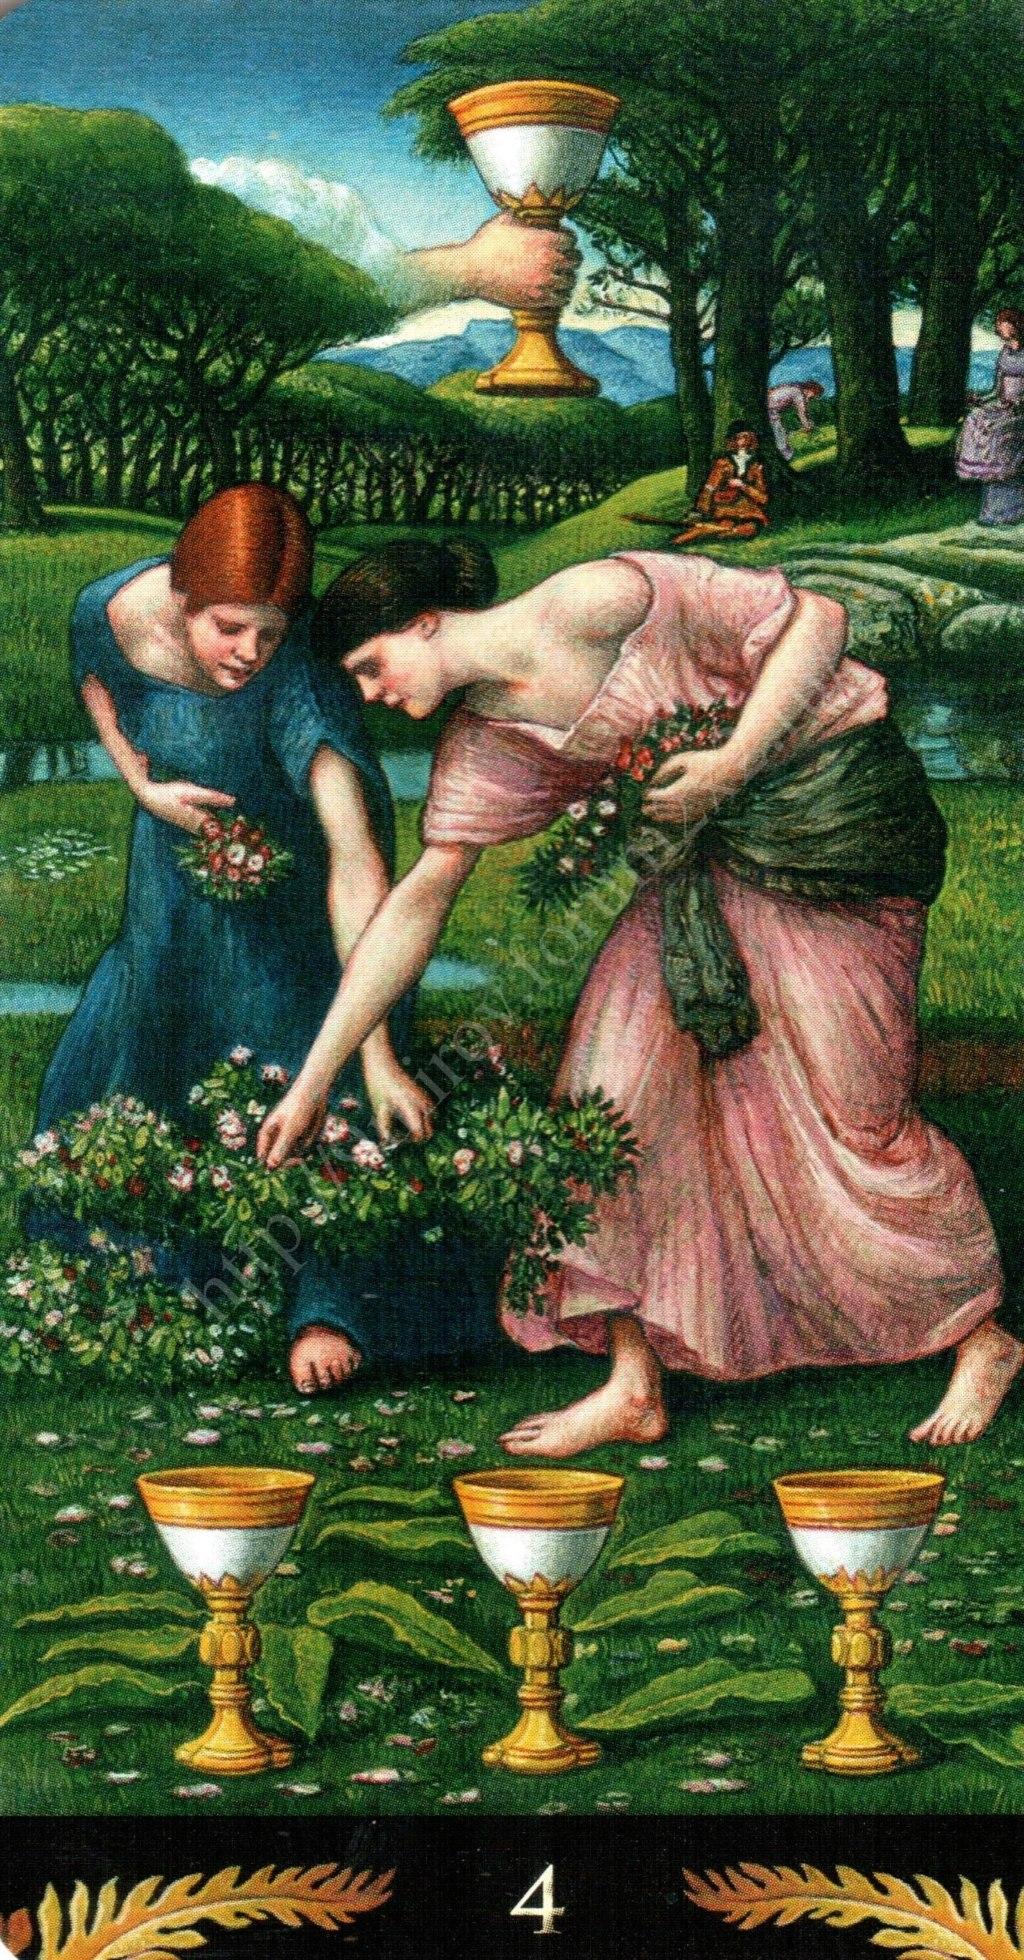 Таро Прерафаэлитов (Pre-Raphaelite Tarot) Галерея Water389